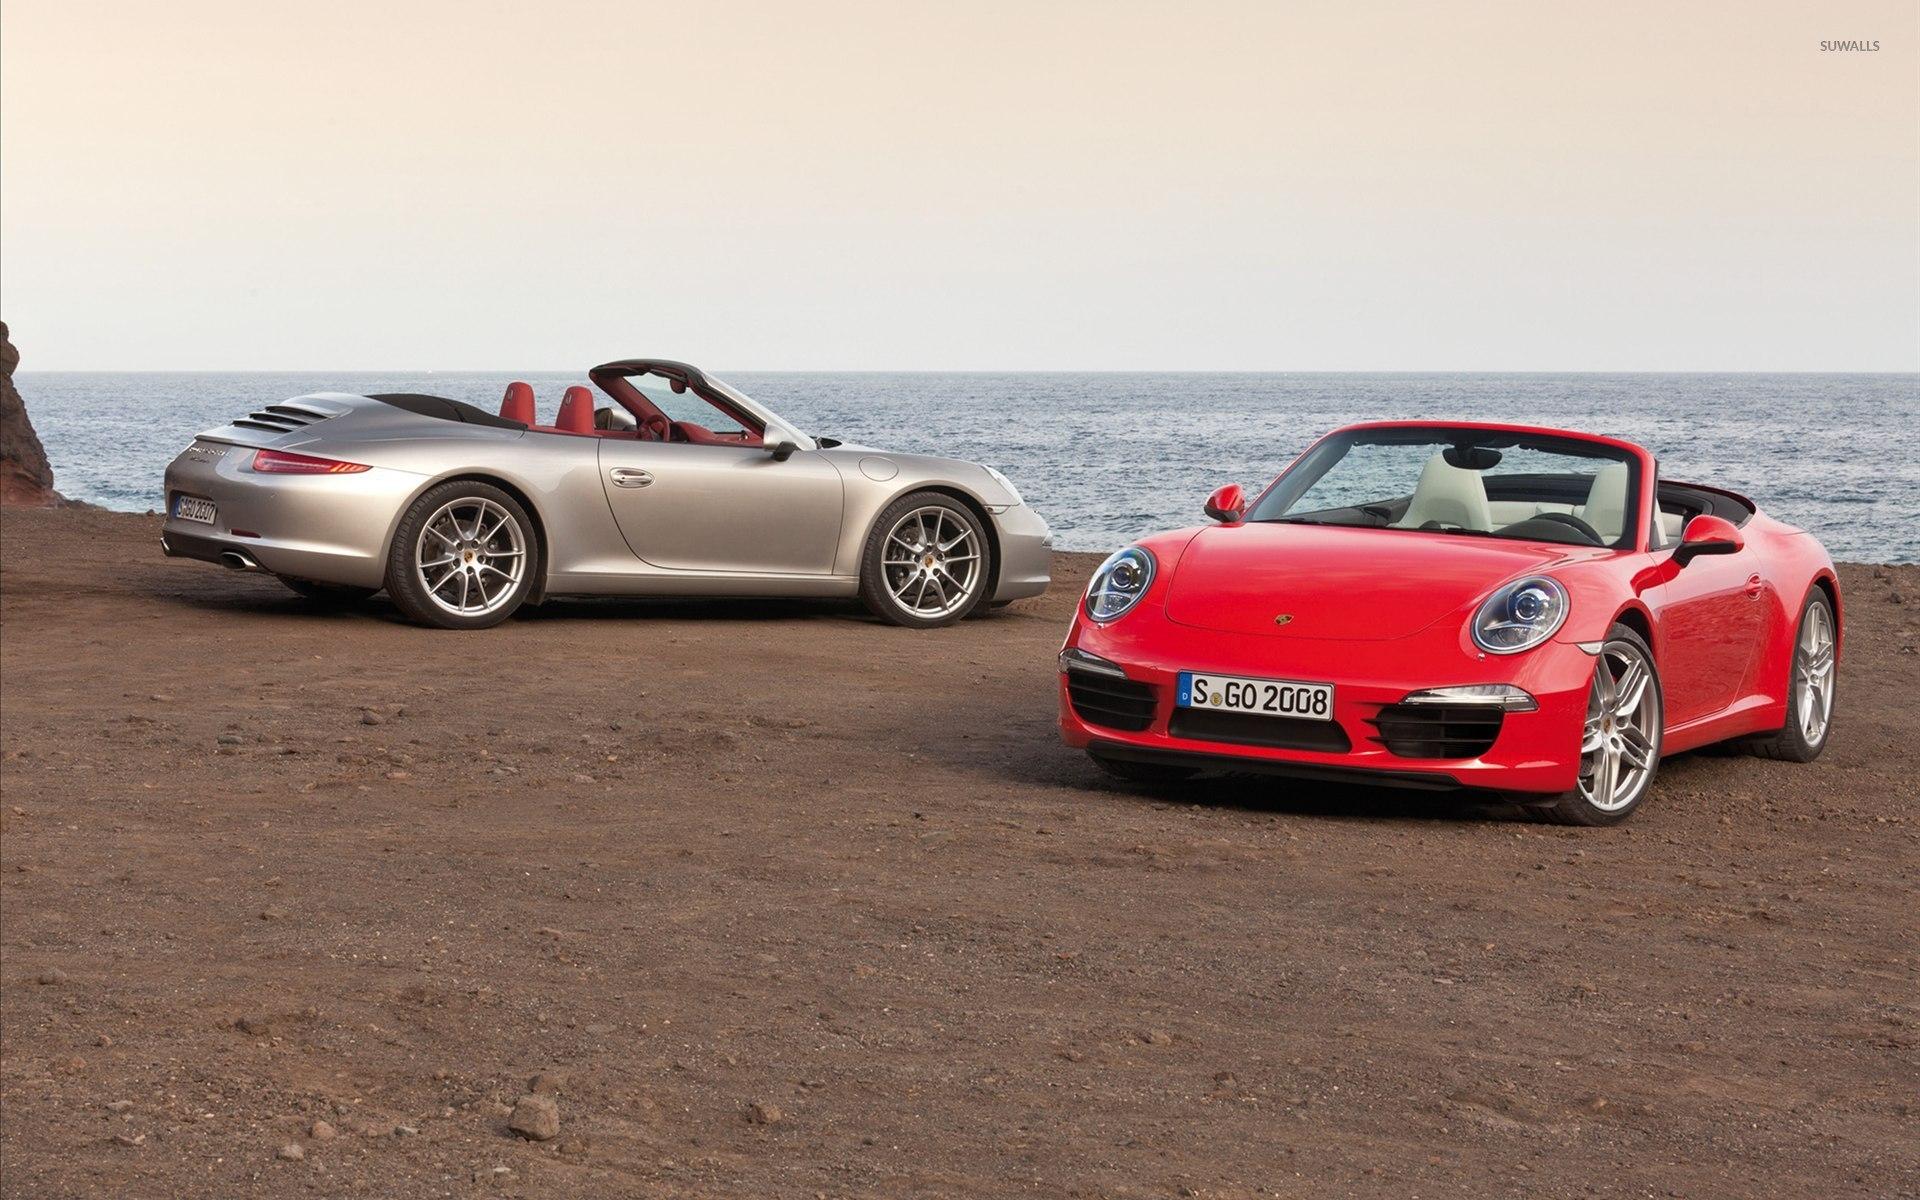 Porsche 911 Carrera S Wallpaper Car Wallpapers 35247